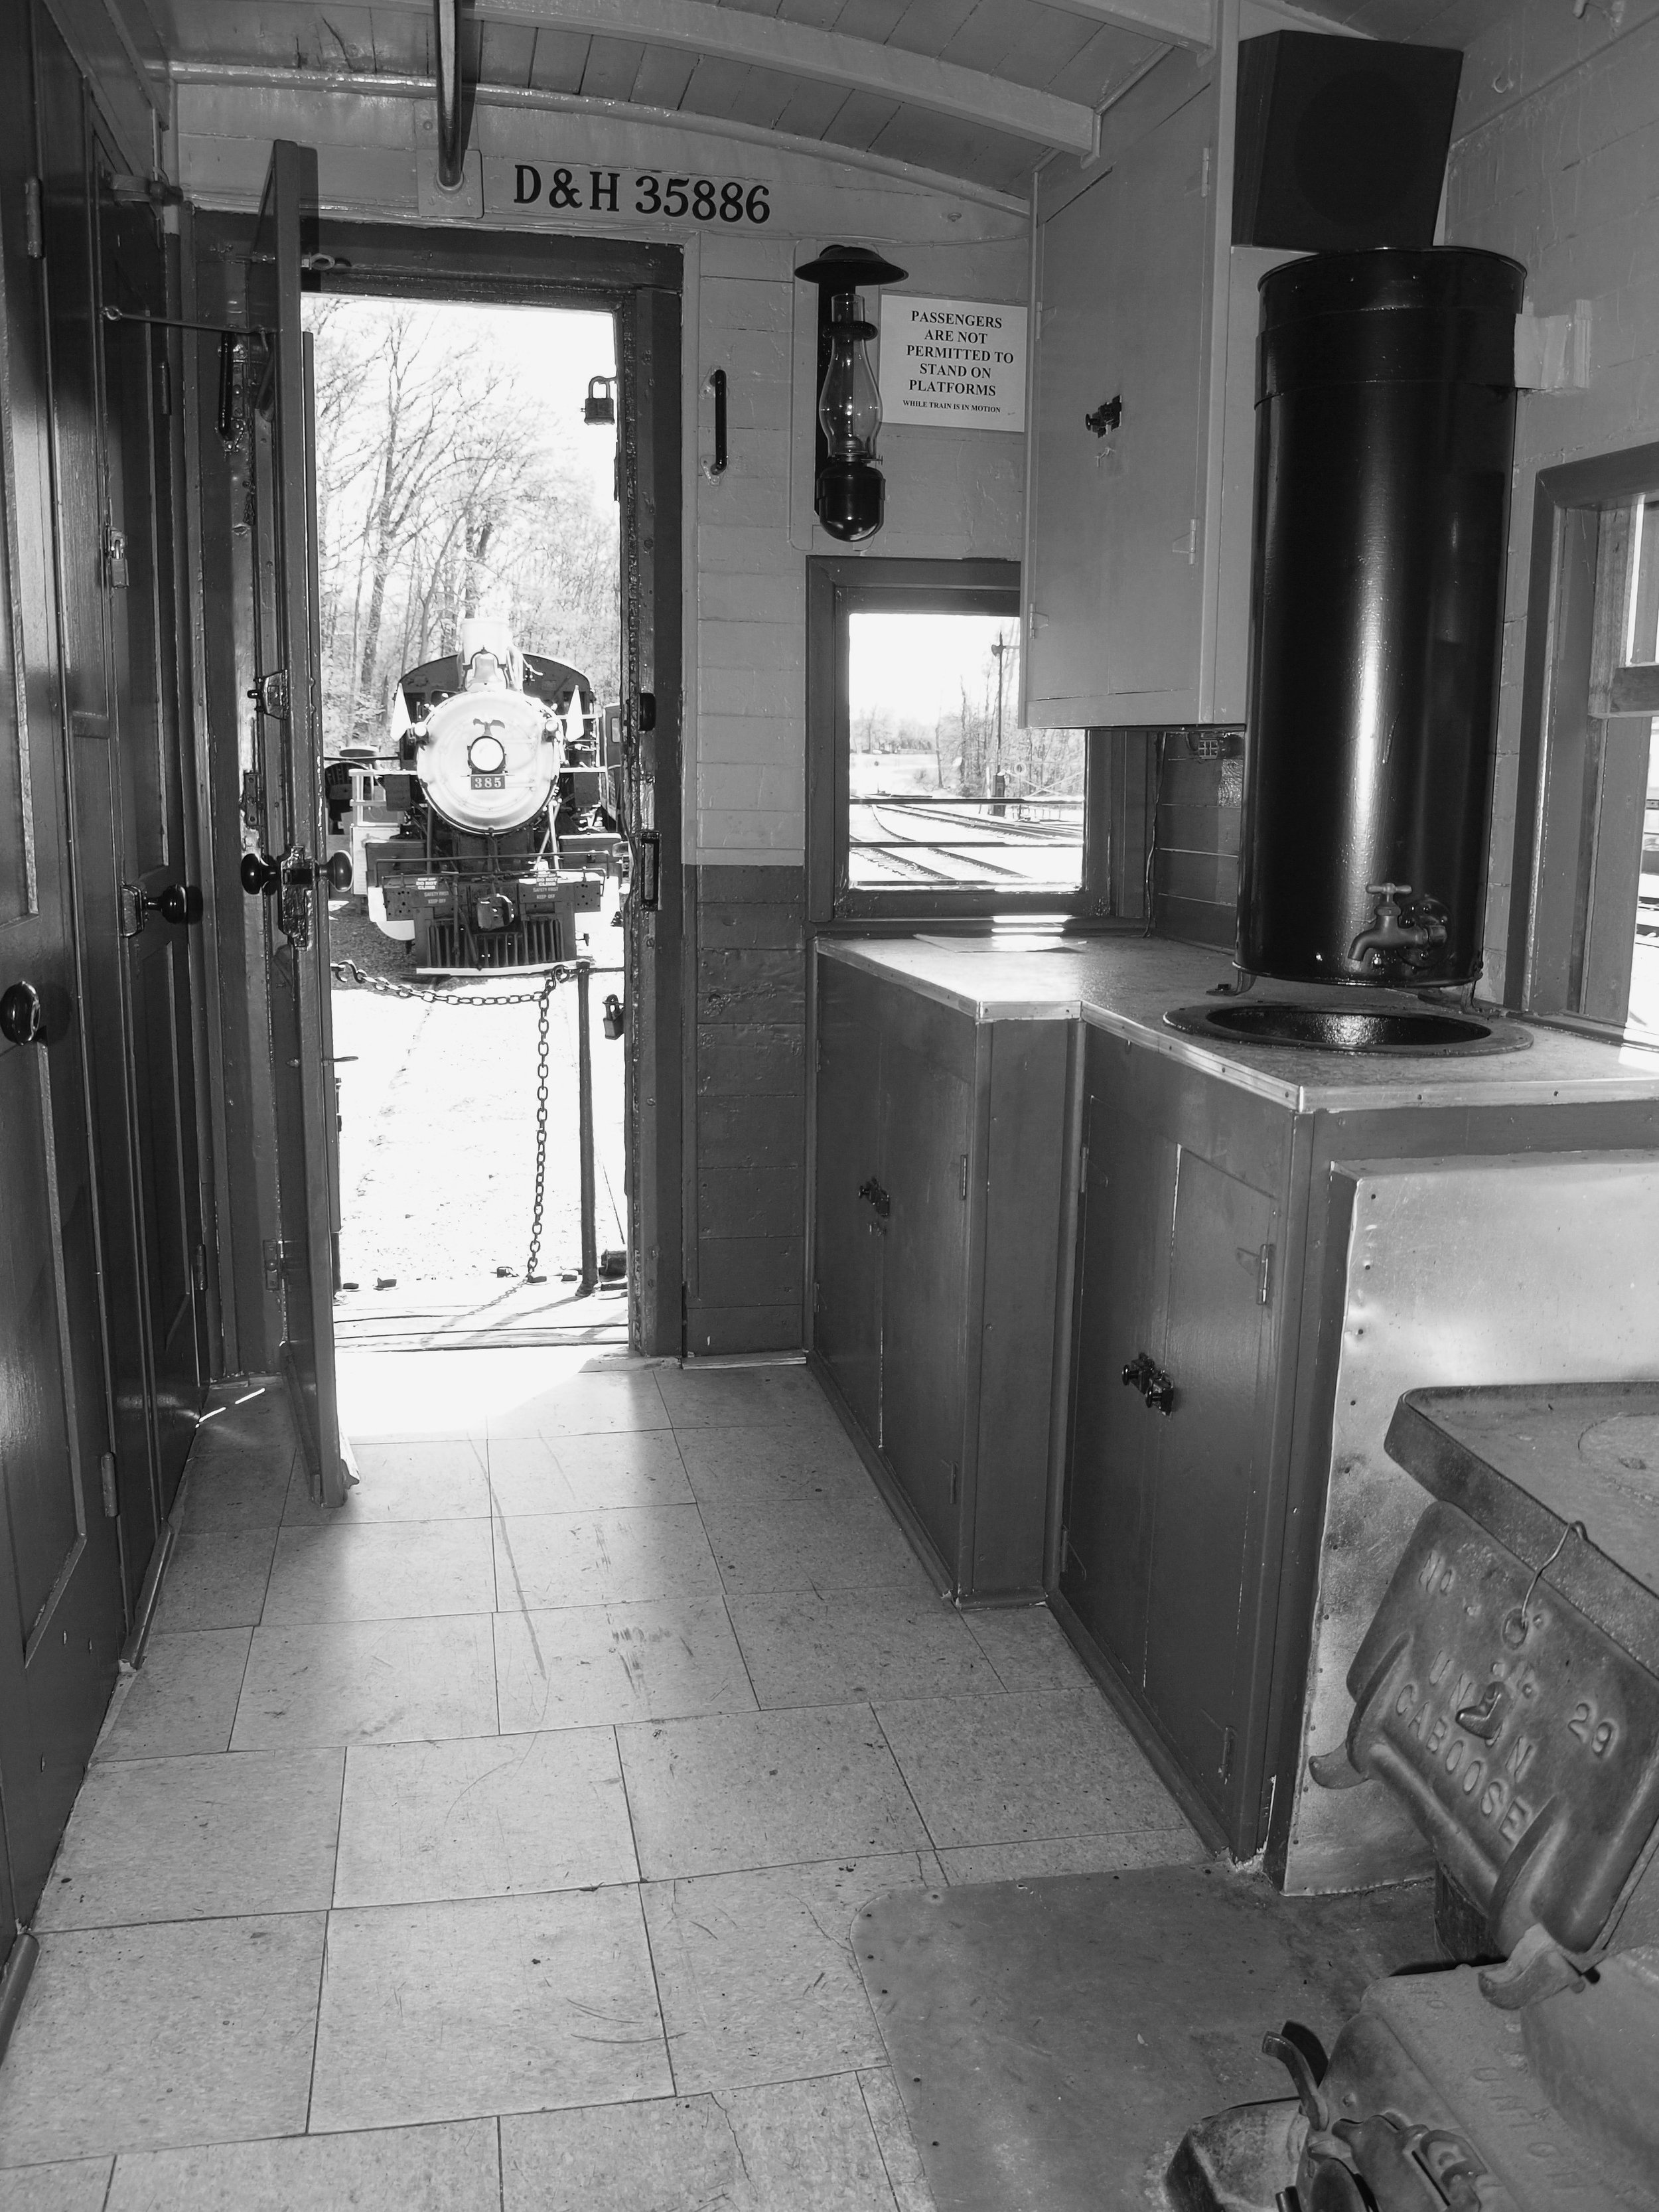 D&H 35886  The interior of Steve Hepler's restored caboose, as it appeared in 2016.  Photo by Steve Hepler.